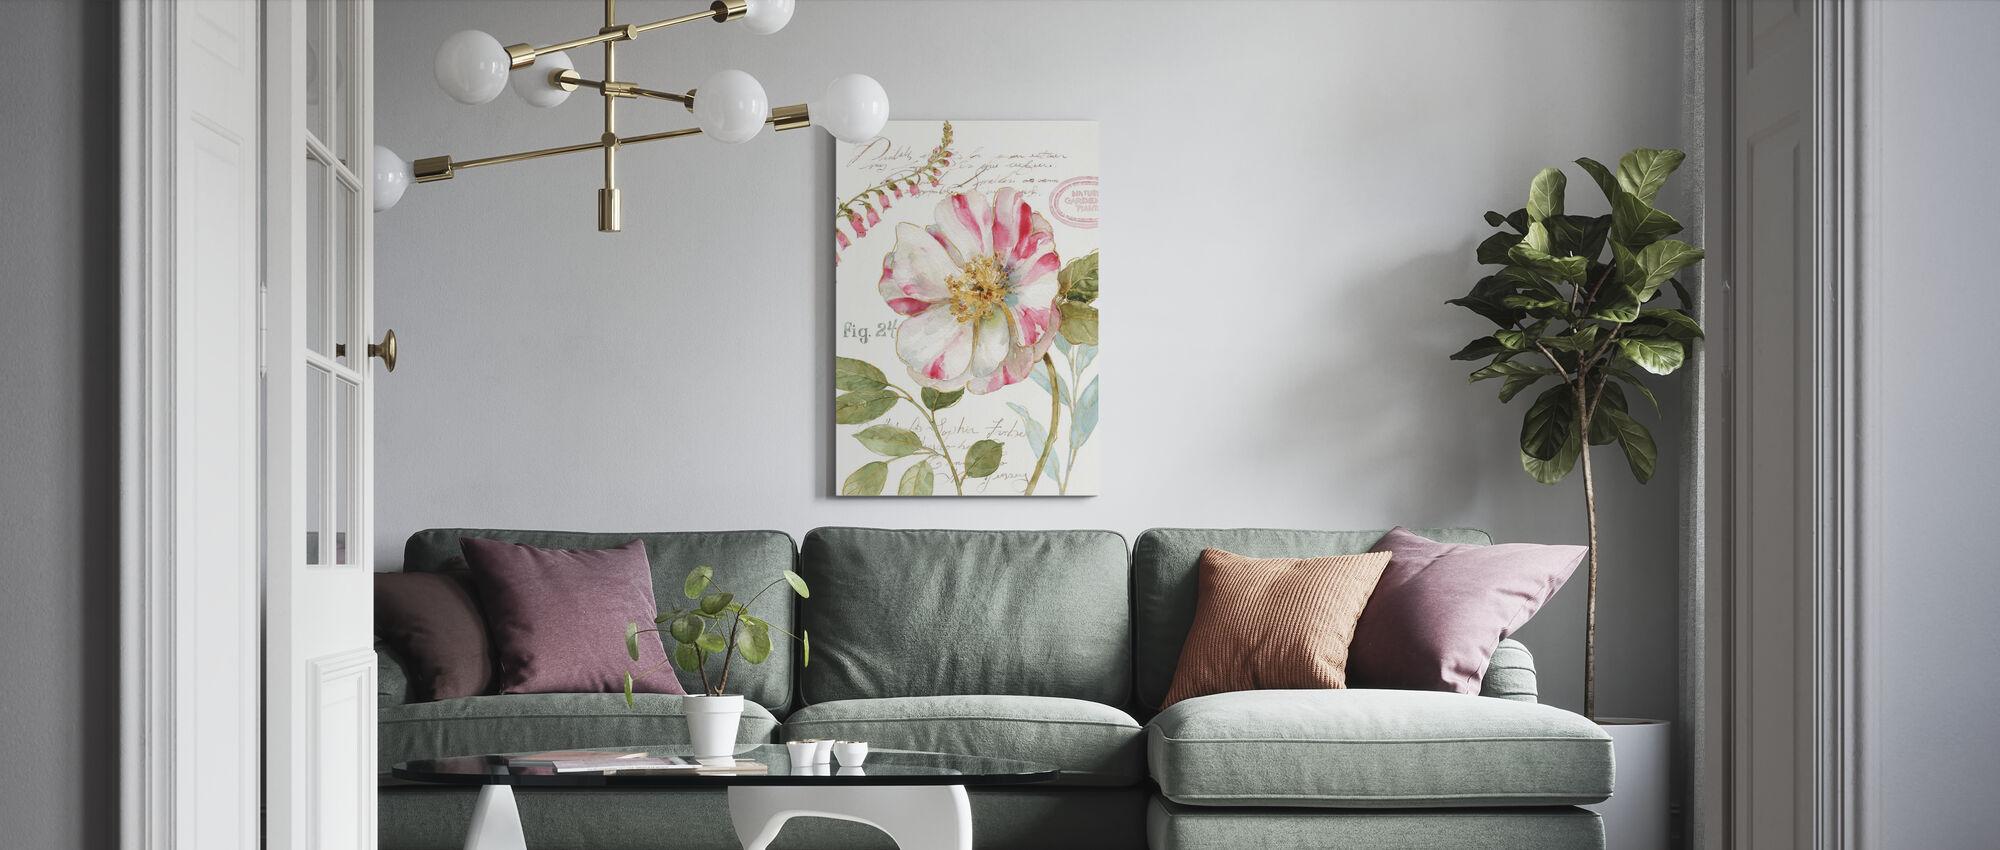 Candy Stokk stripete Blomst - Lerretsbilde - Stue